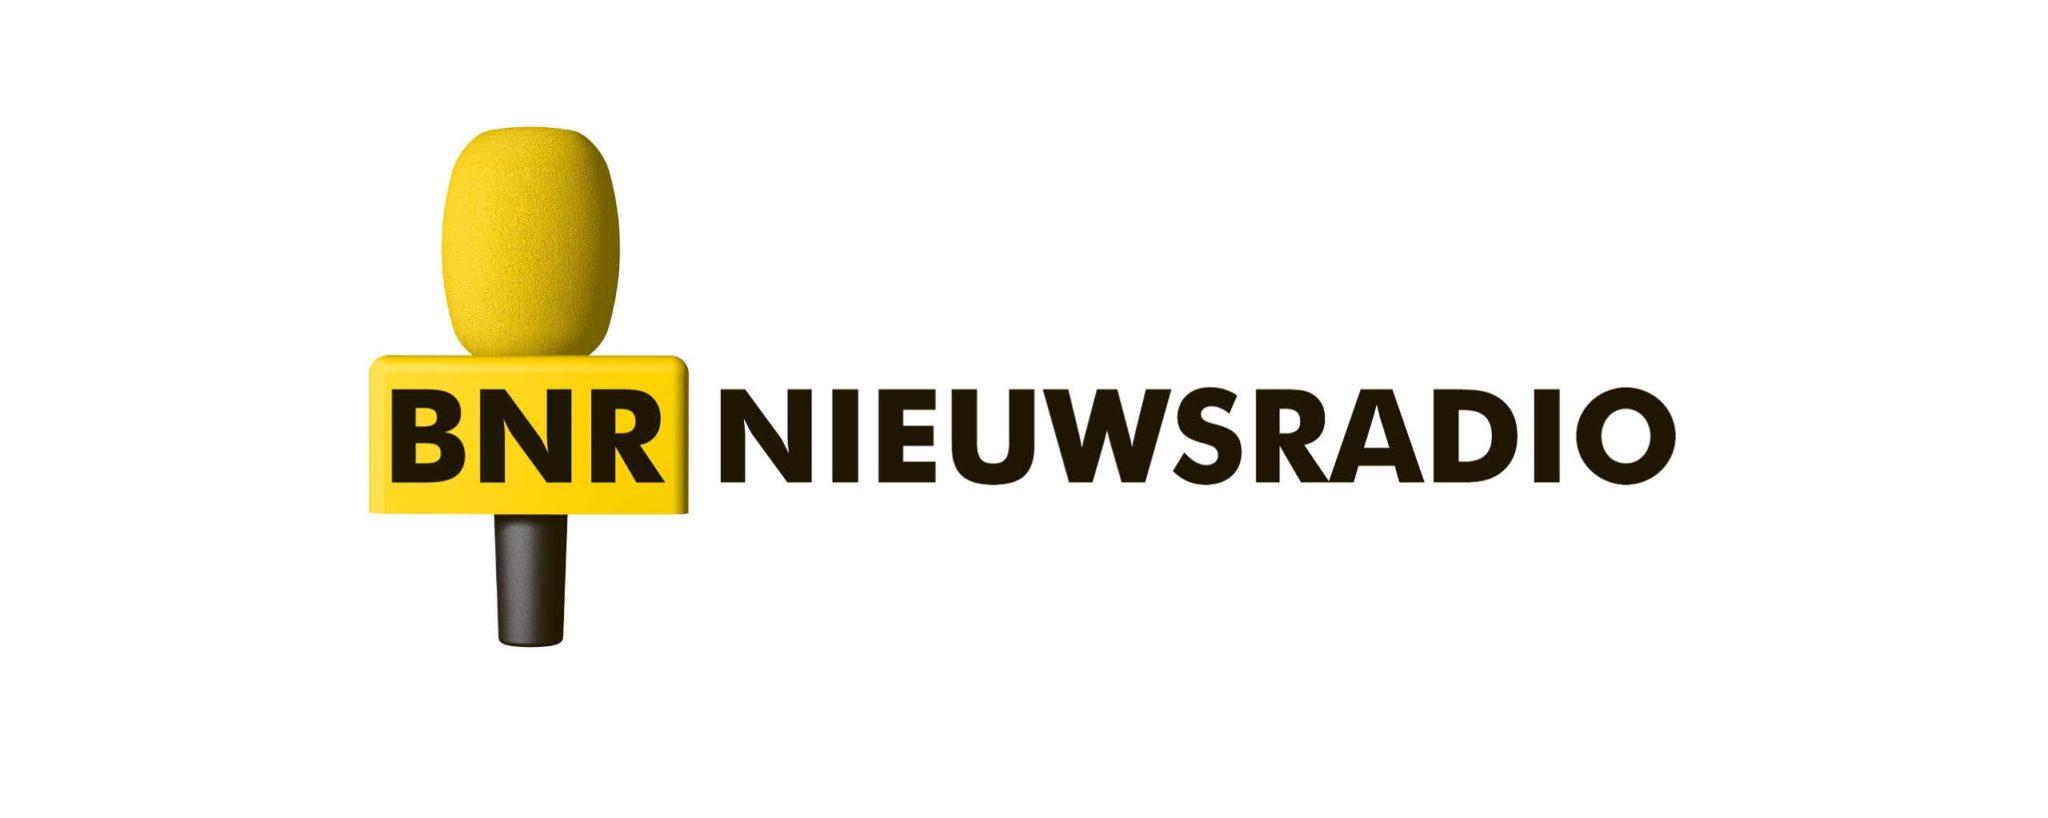 BNR nieuwsradio - PFAS